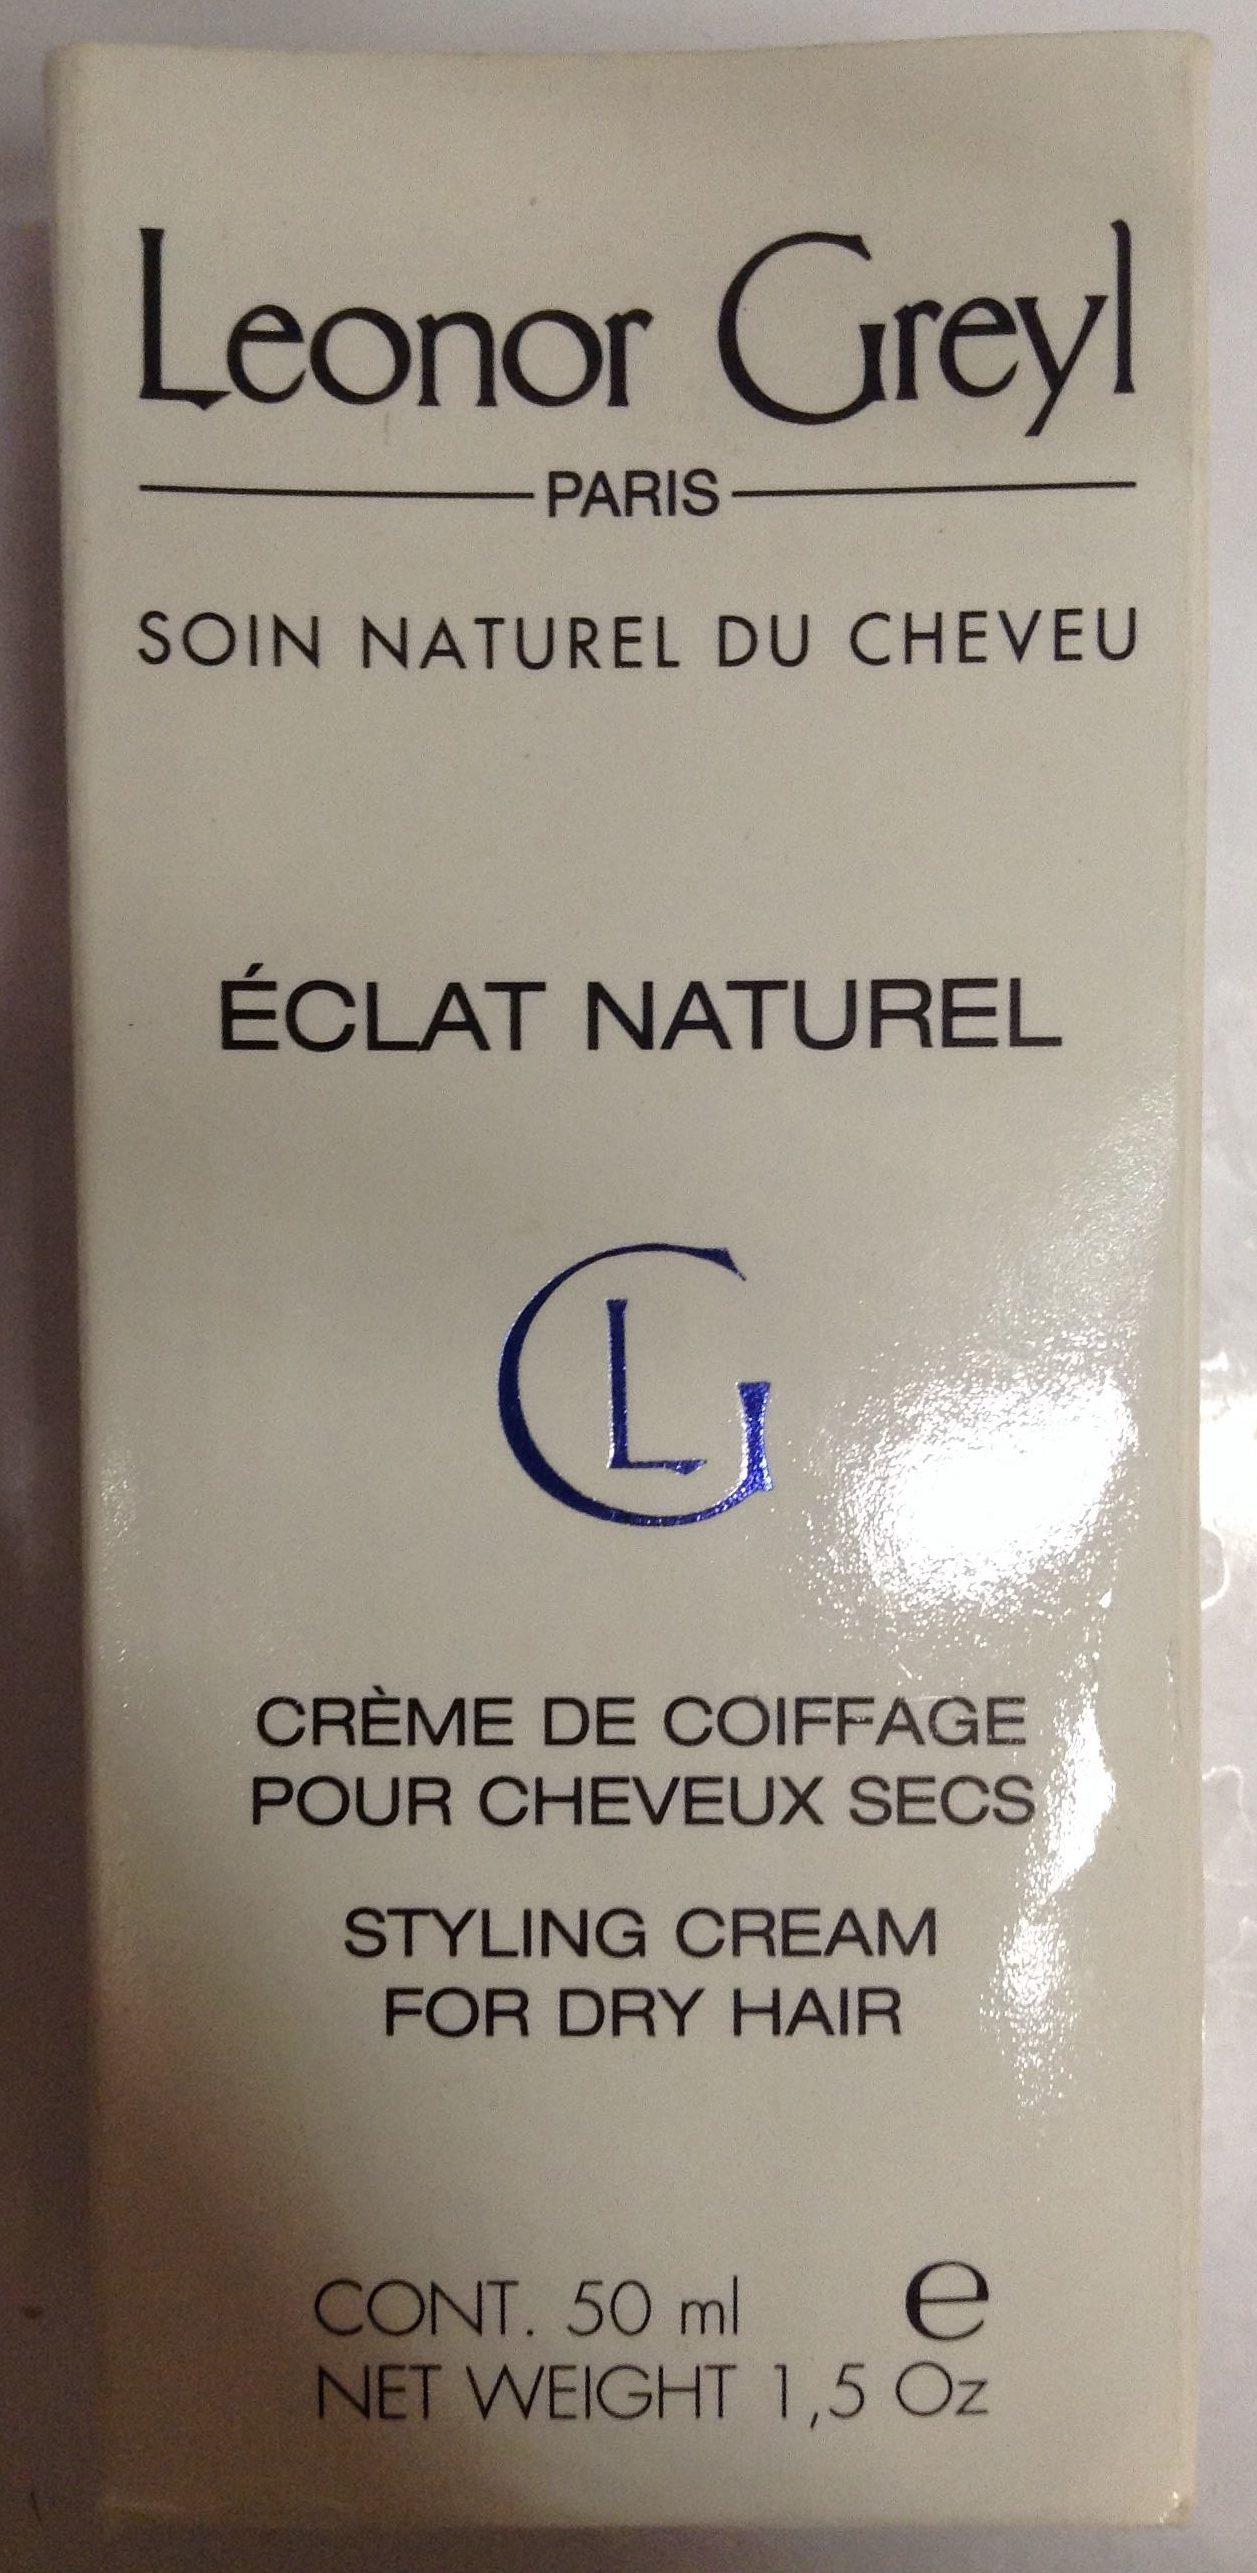 Eclat Naturel - Produit - fr